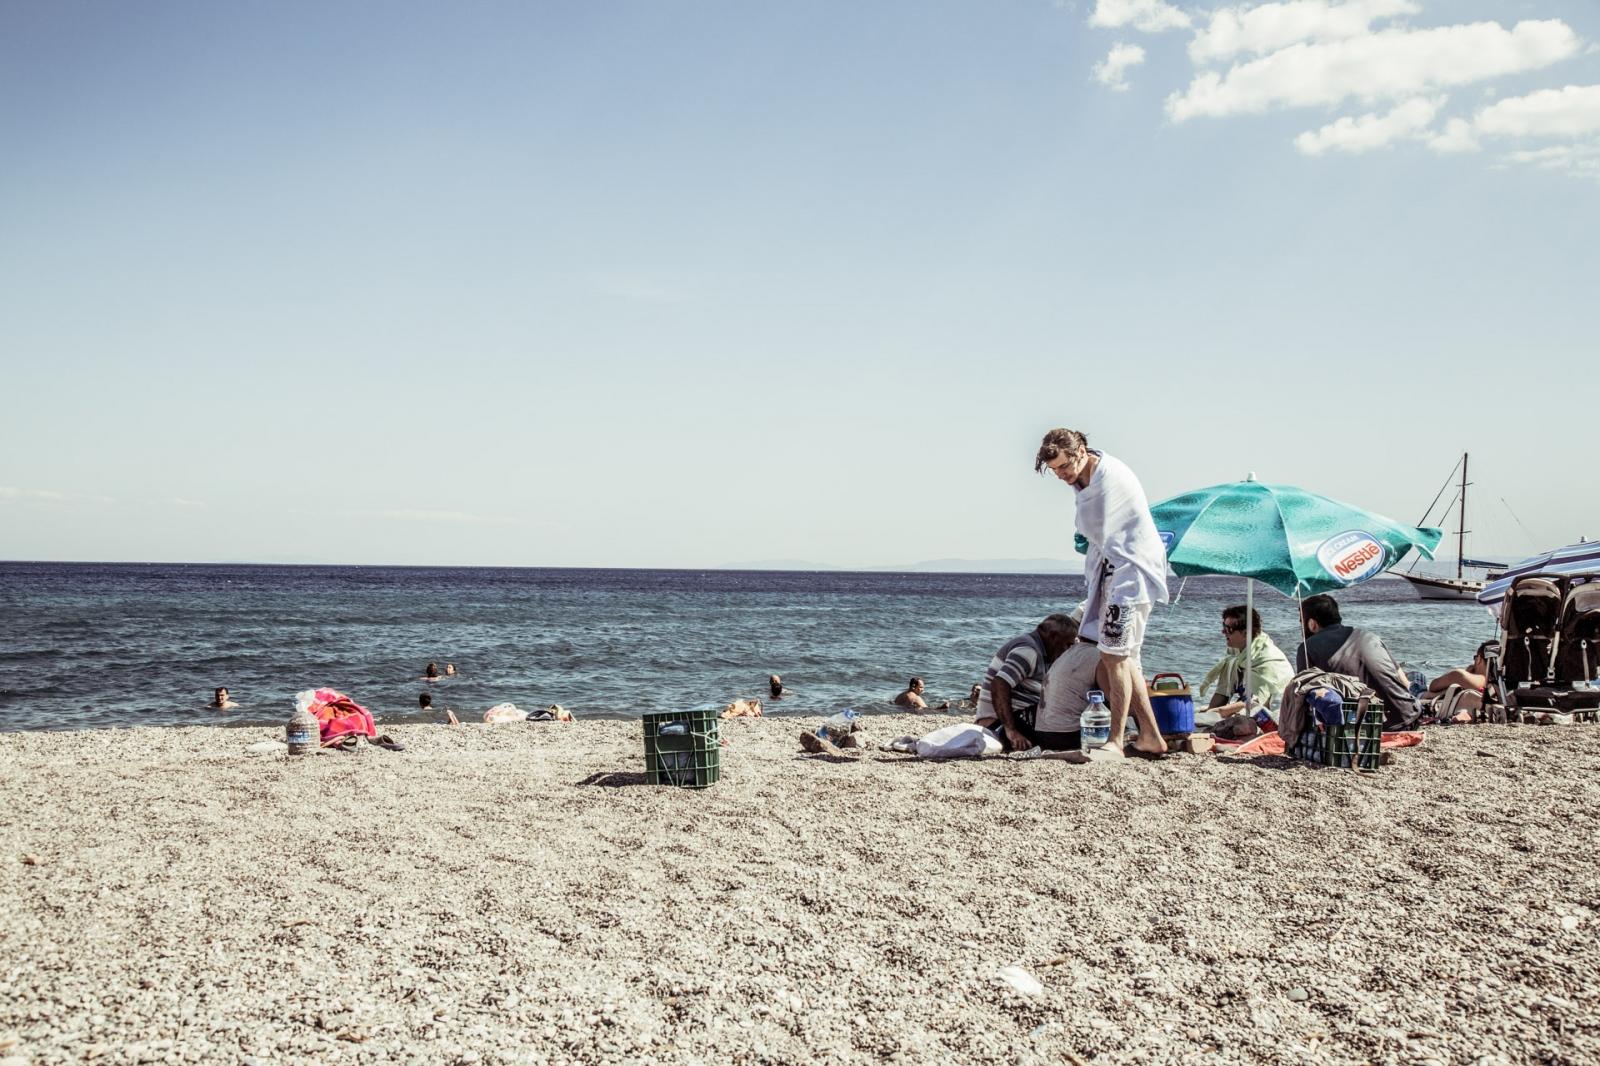 Bayram on the beach, Turkey